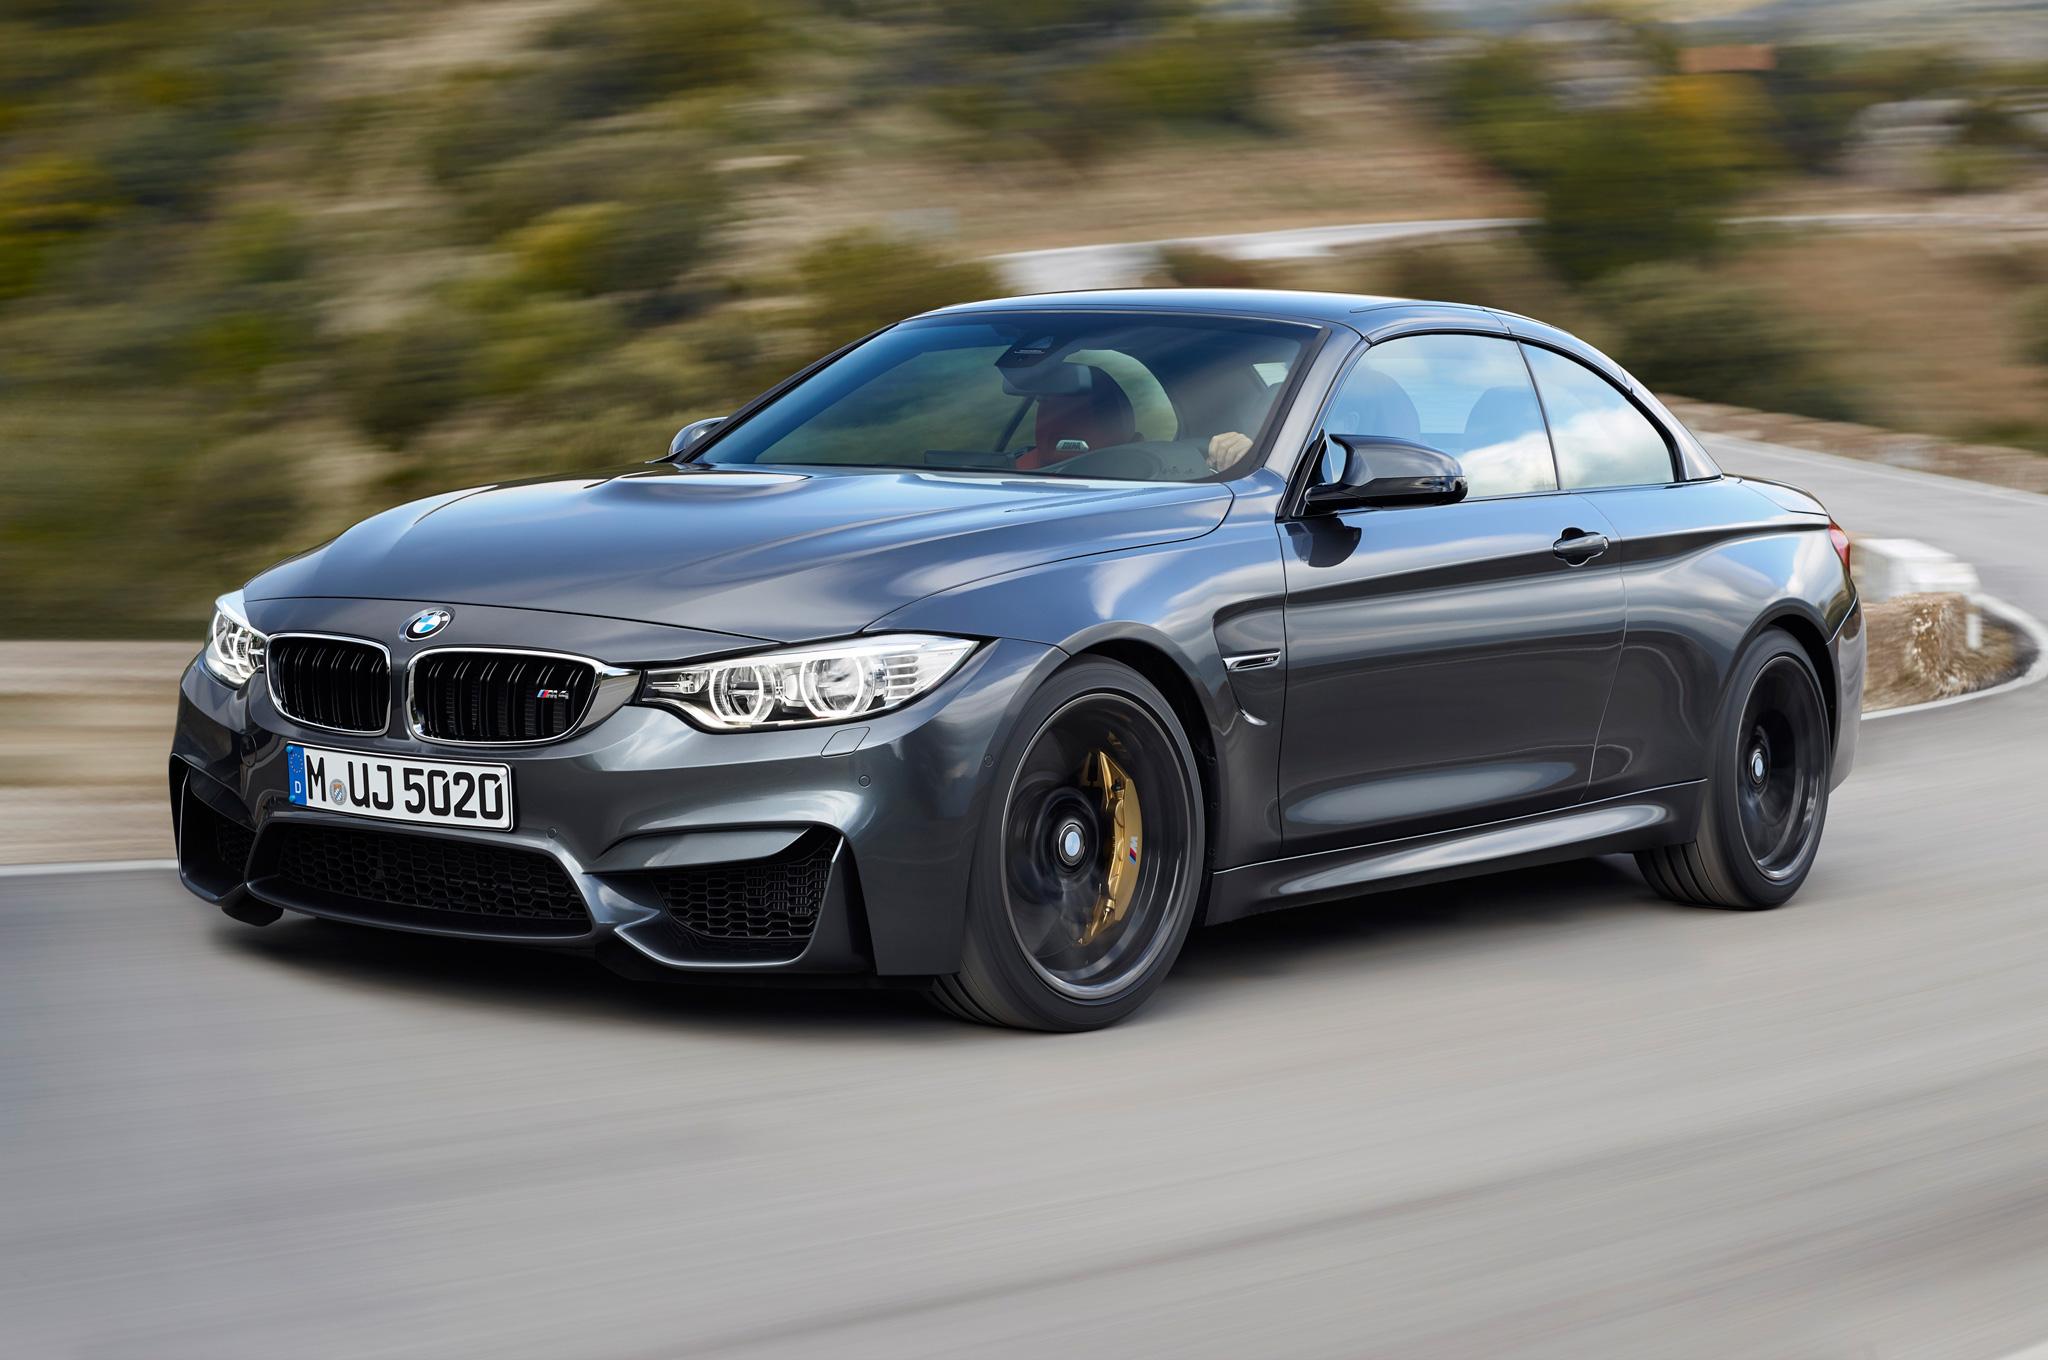 2015 BMW M4 Convertible Road Performance